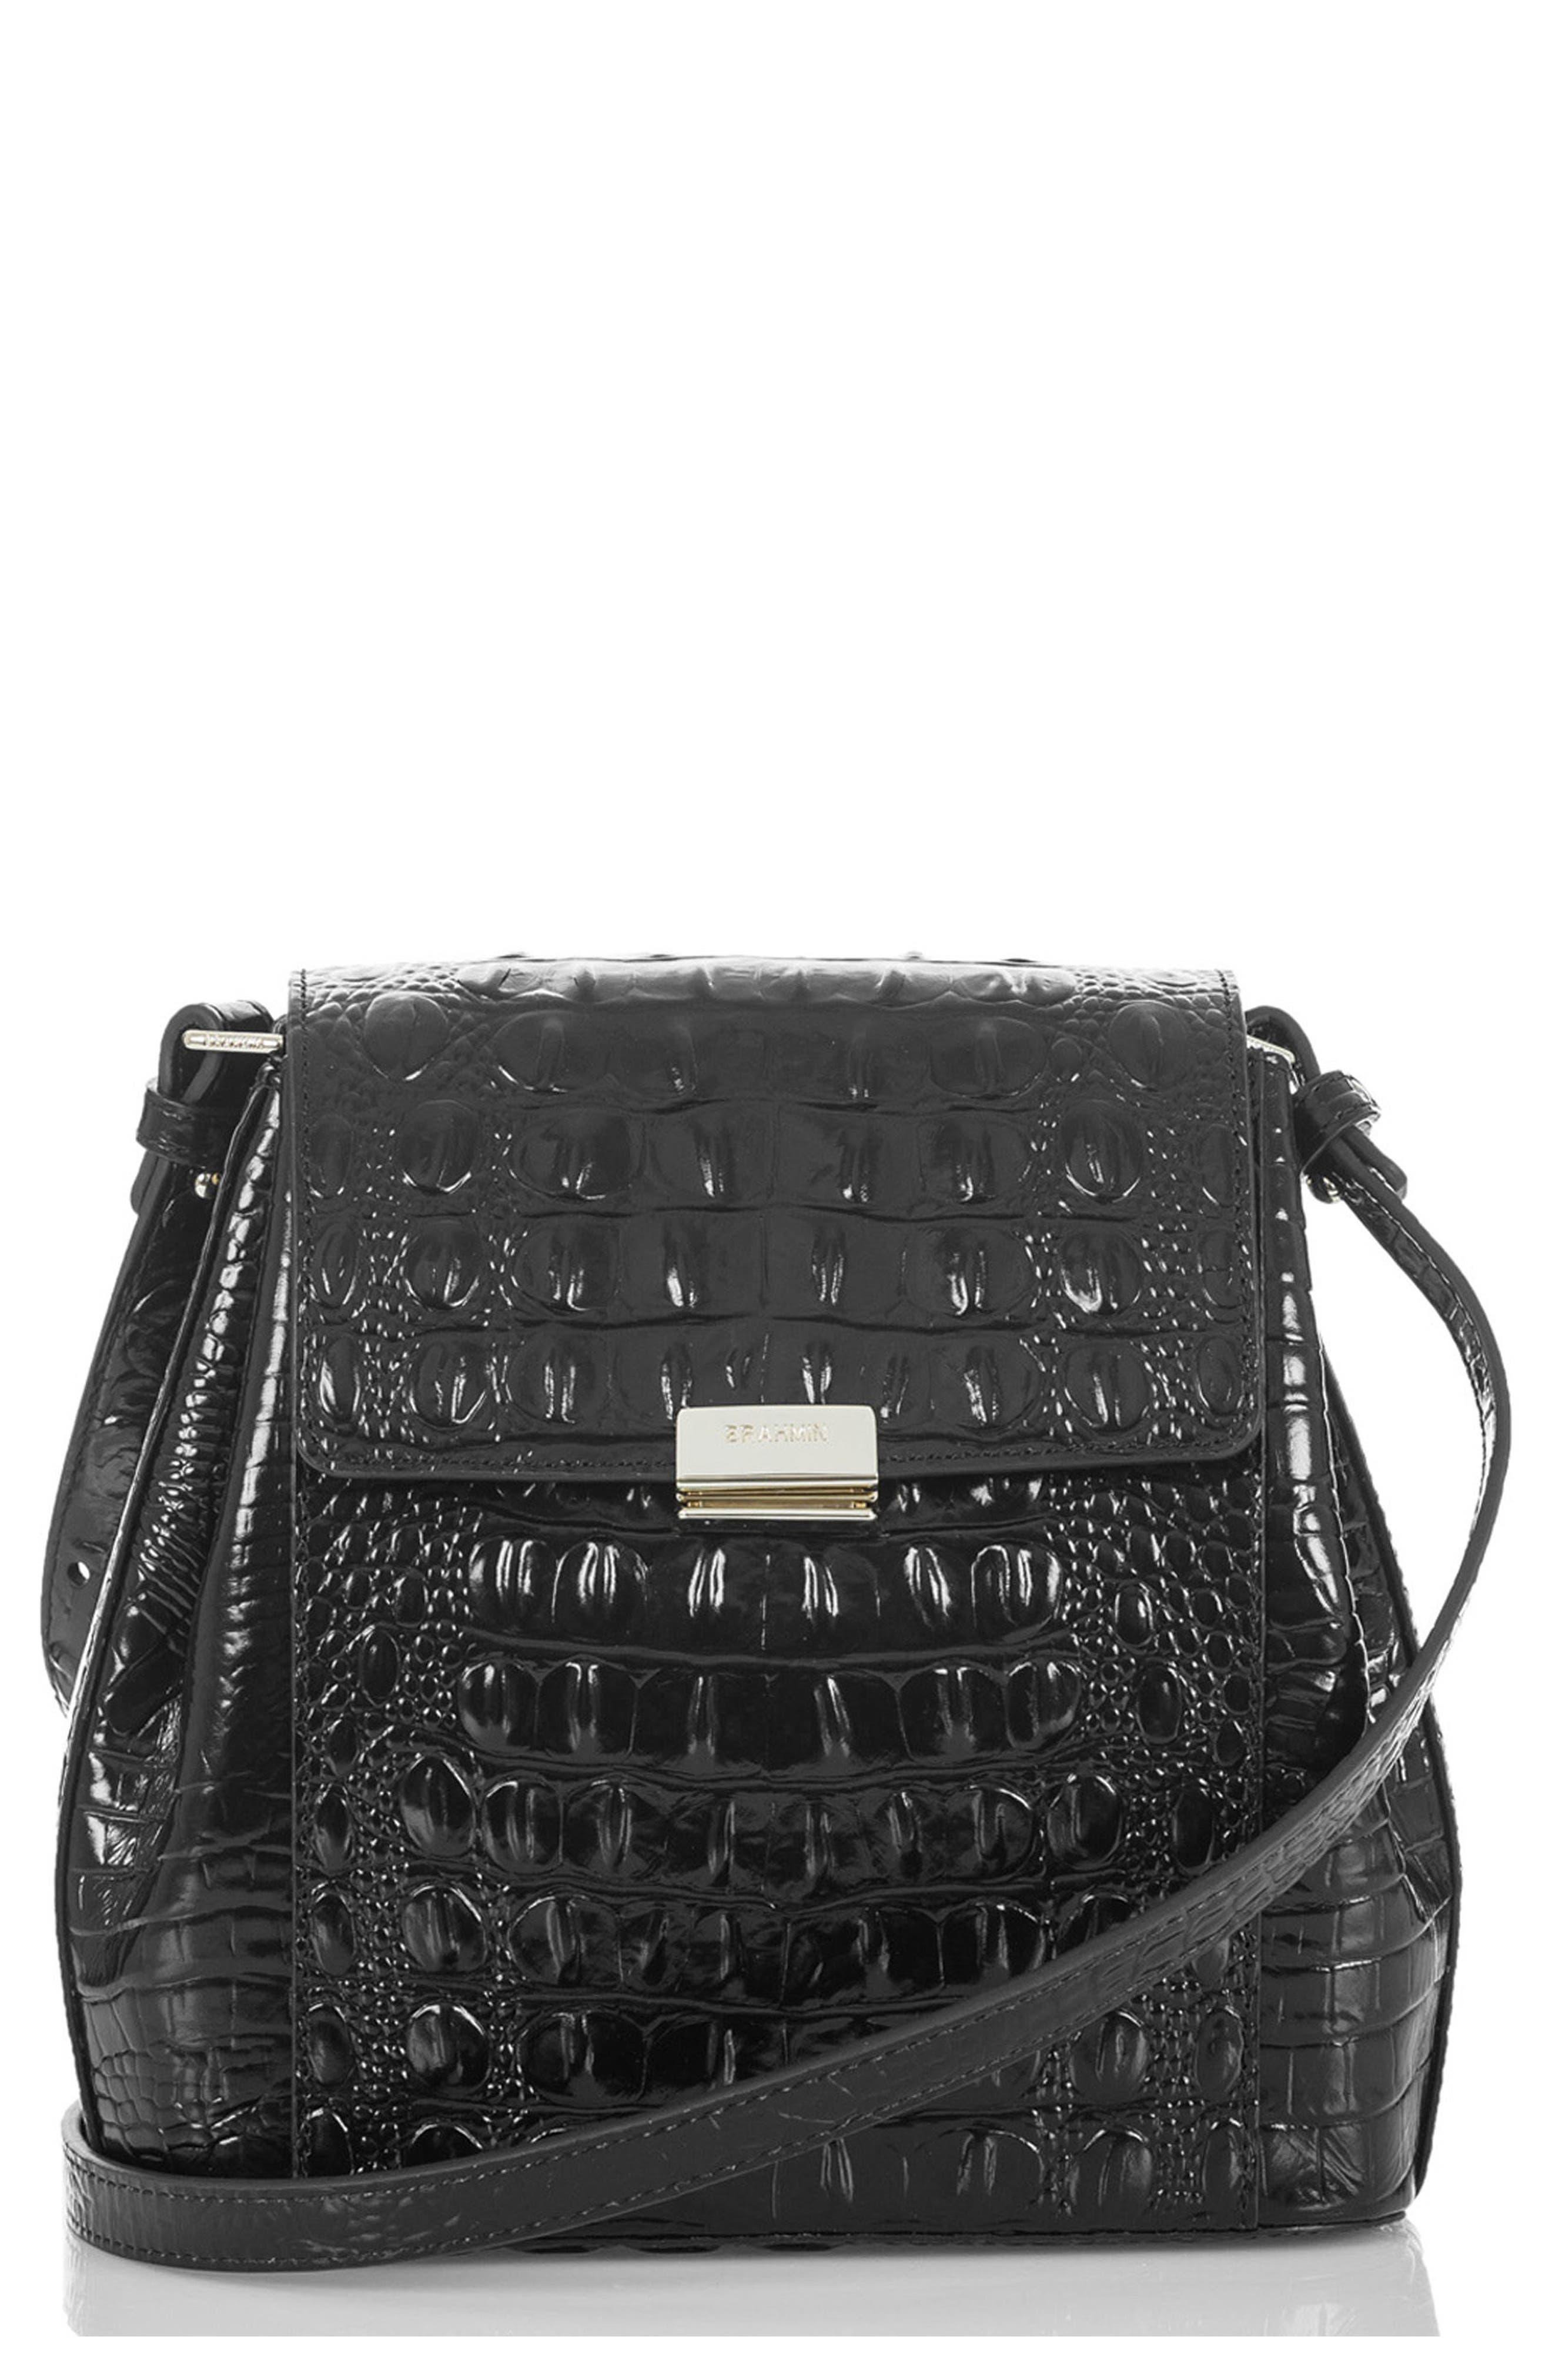 Margo Croc Embossed Leather Crossbody Bag,                             Main thumbnail 1, color,                             BLACK